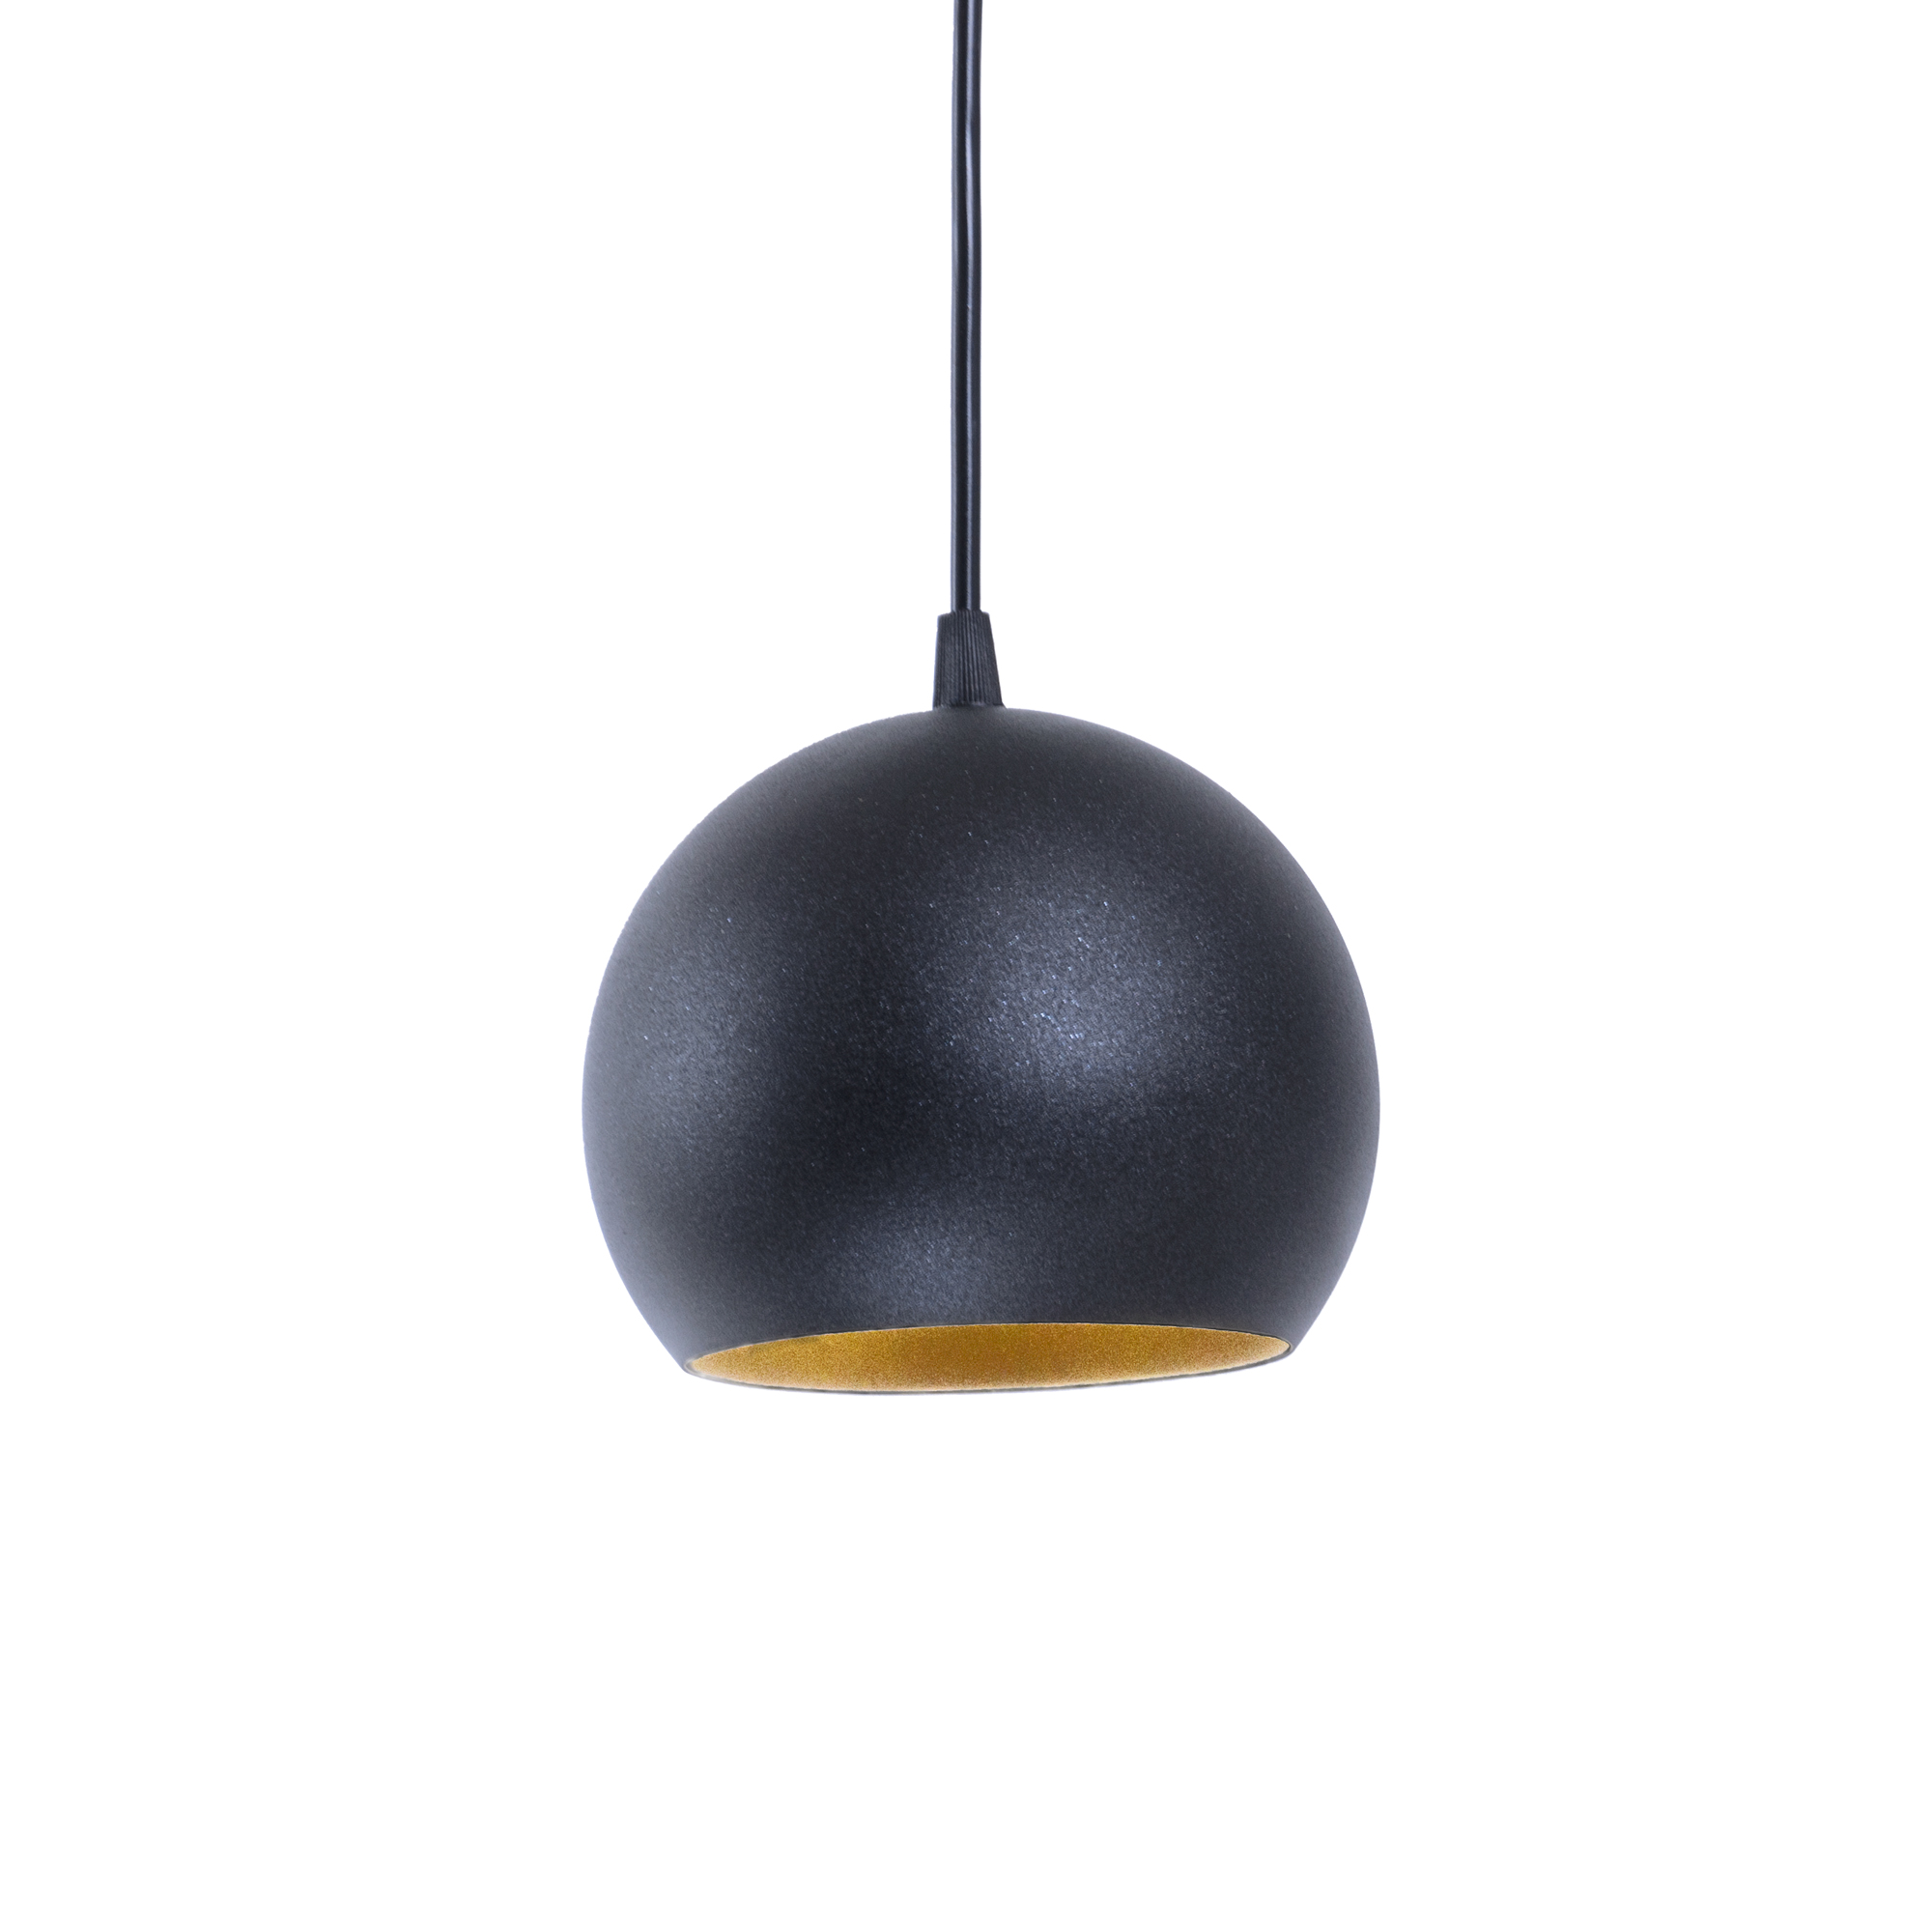 Люстра подвесная Atma Light серии Shade Bowl P150 BlackM/Gold